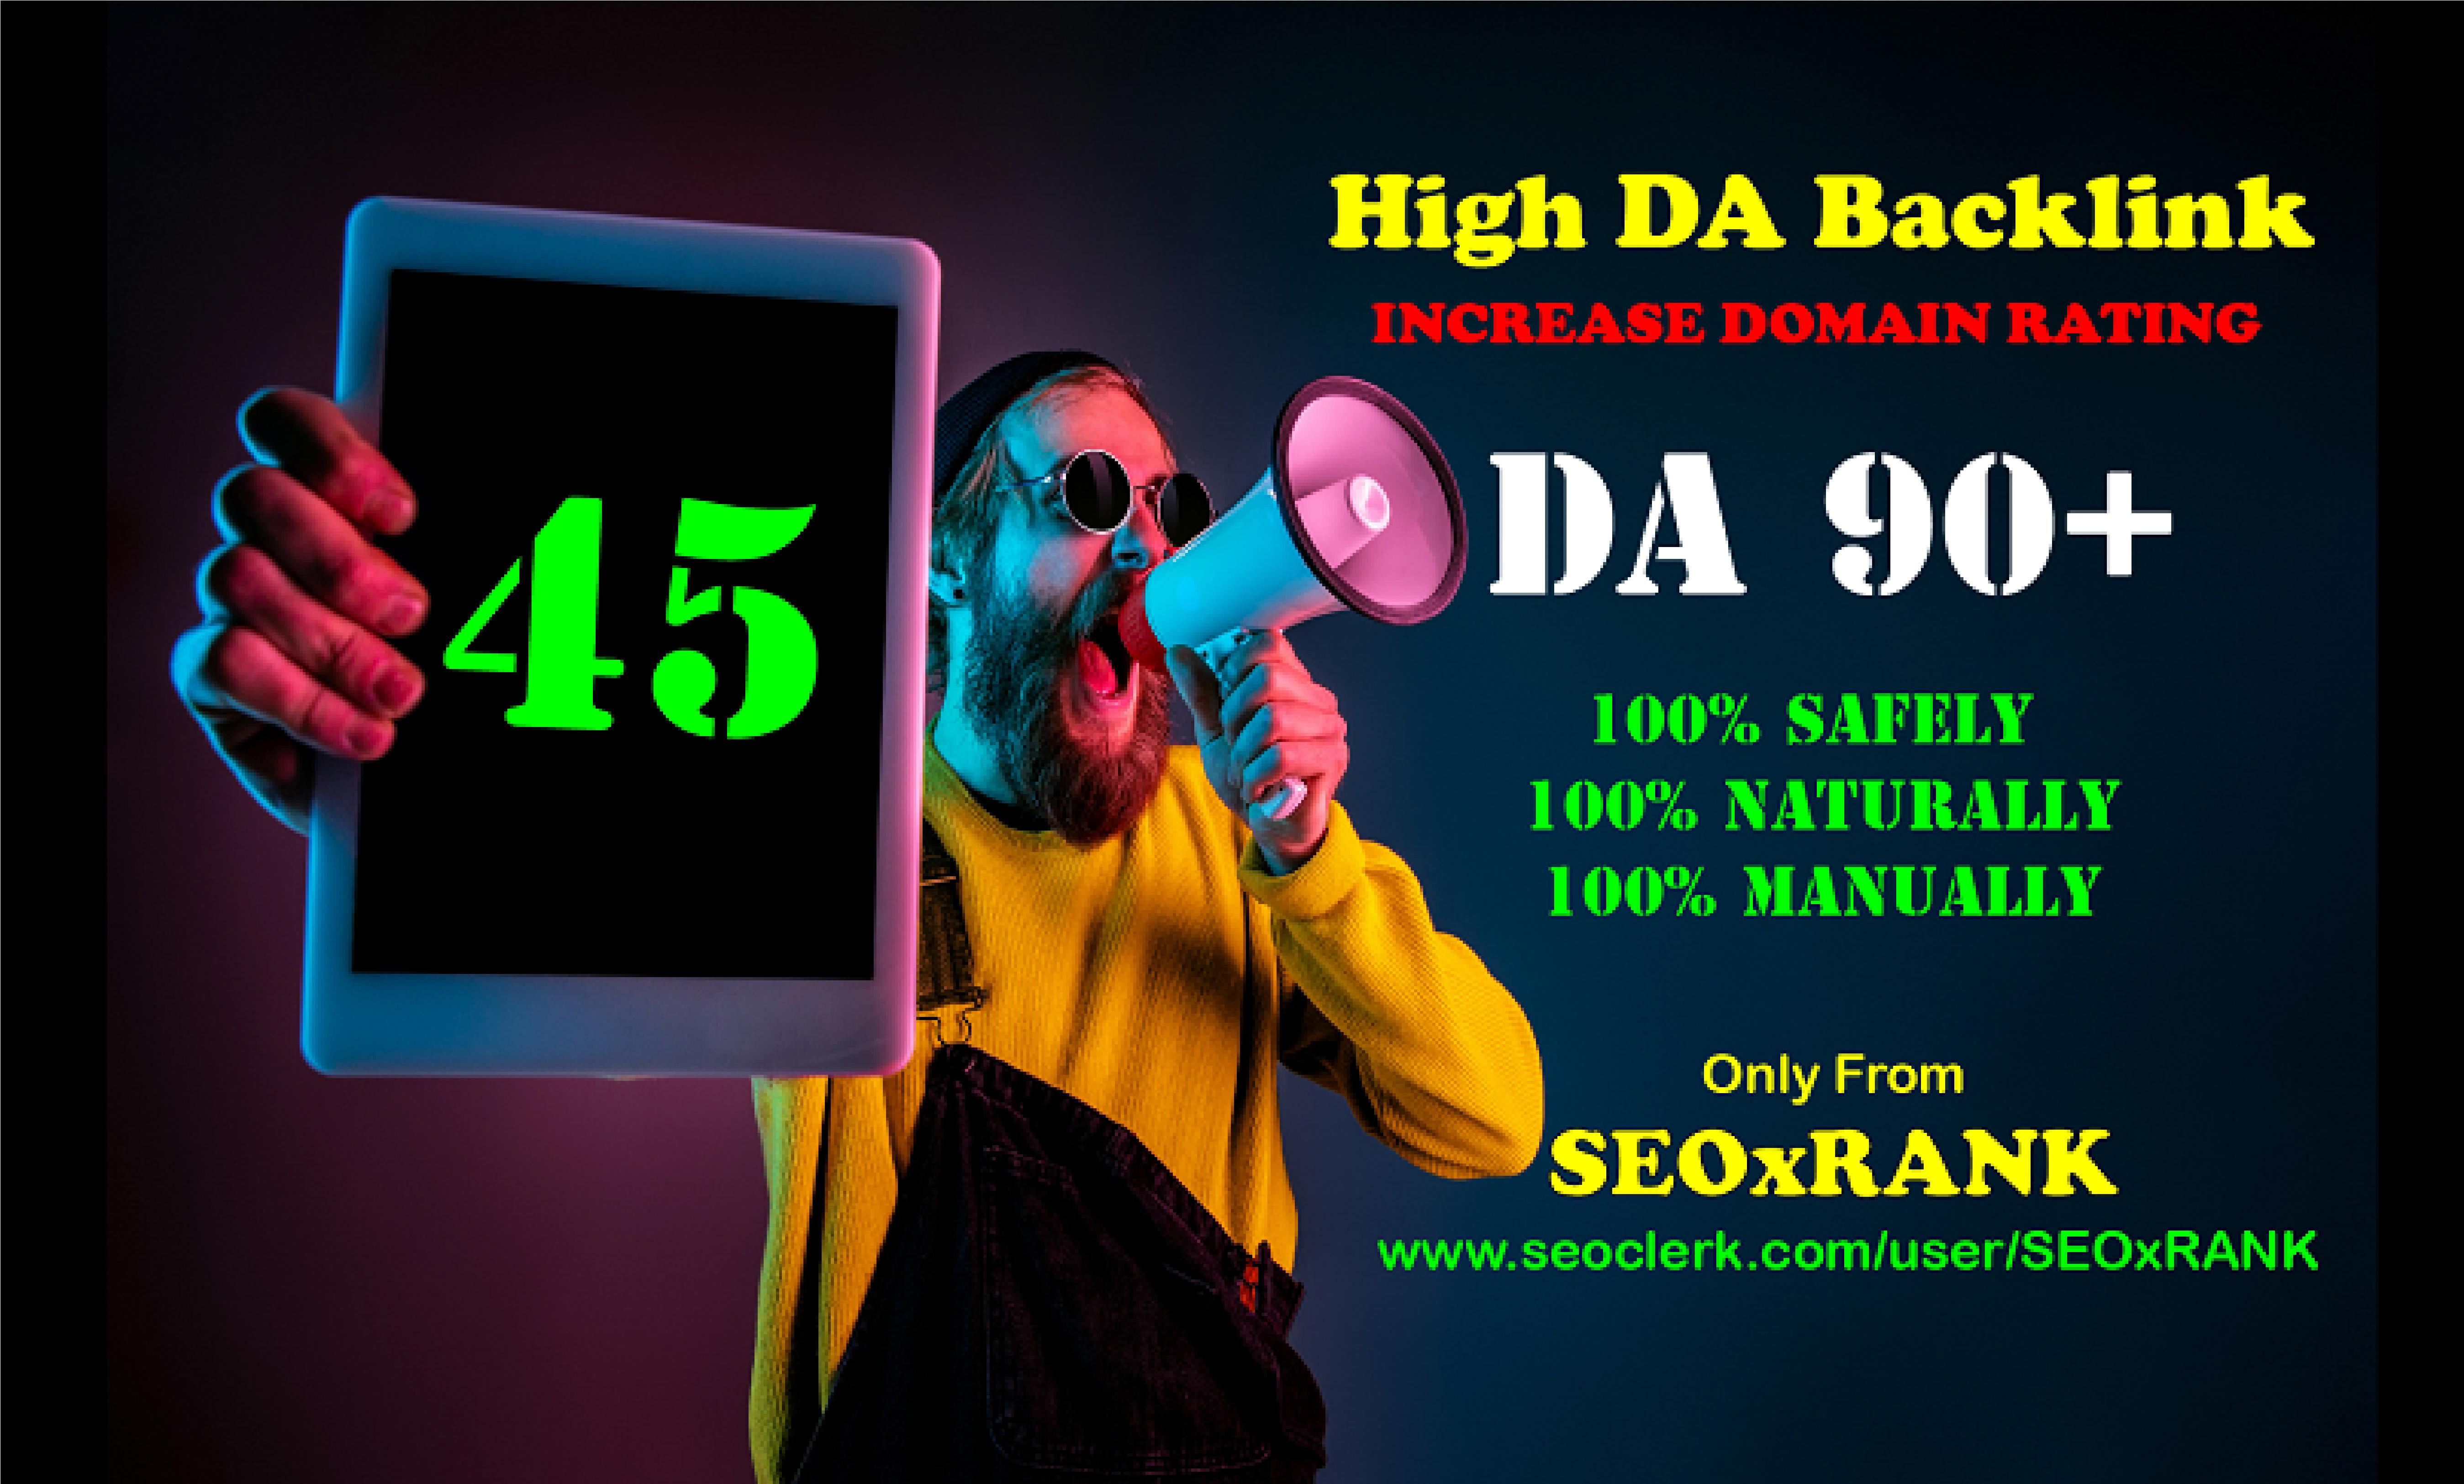 Authentic 45 DA90+ High DA SEO Backlinks to Increase Domain Rating 2021